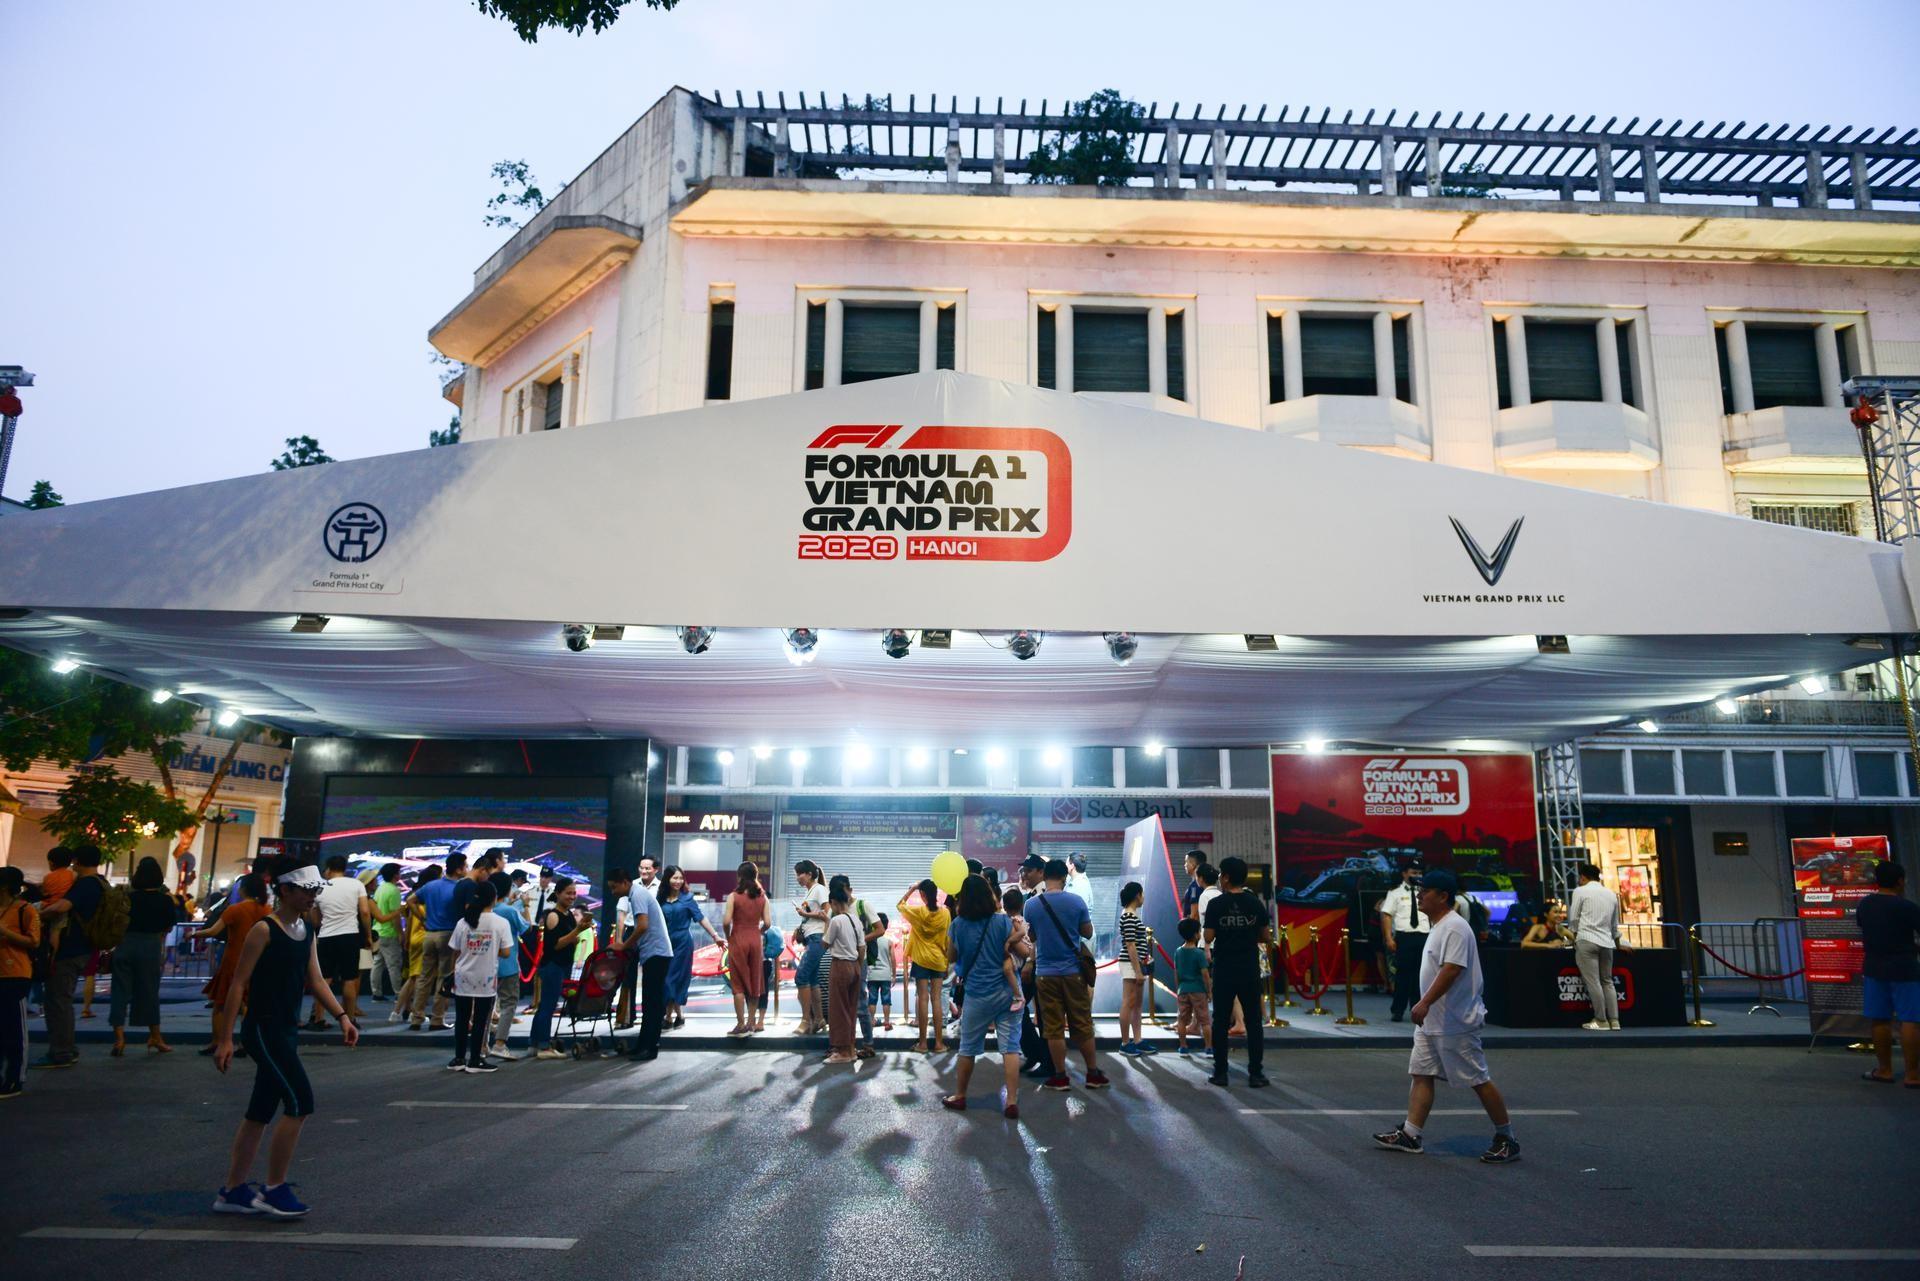 Vietnam grand prix_entertainment_exhibition